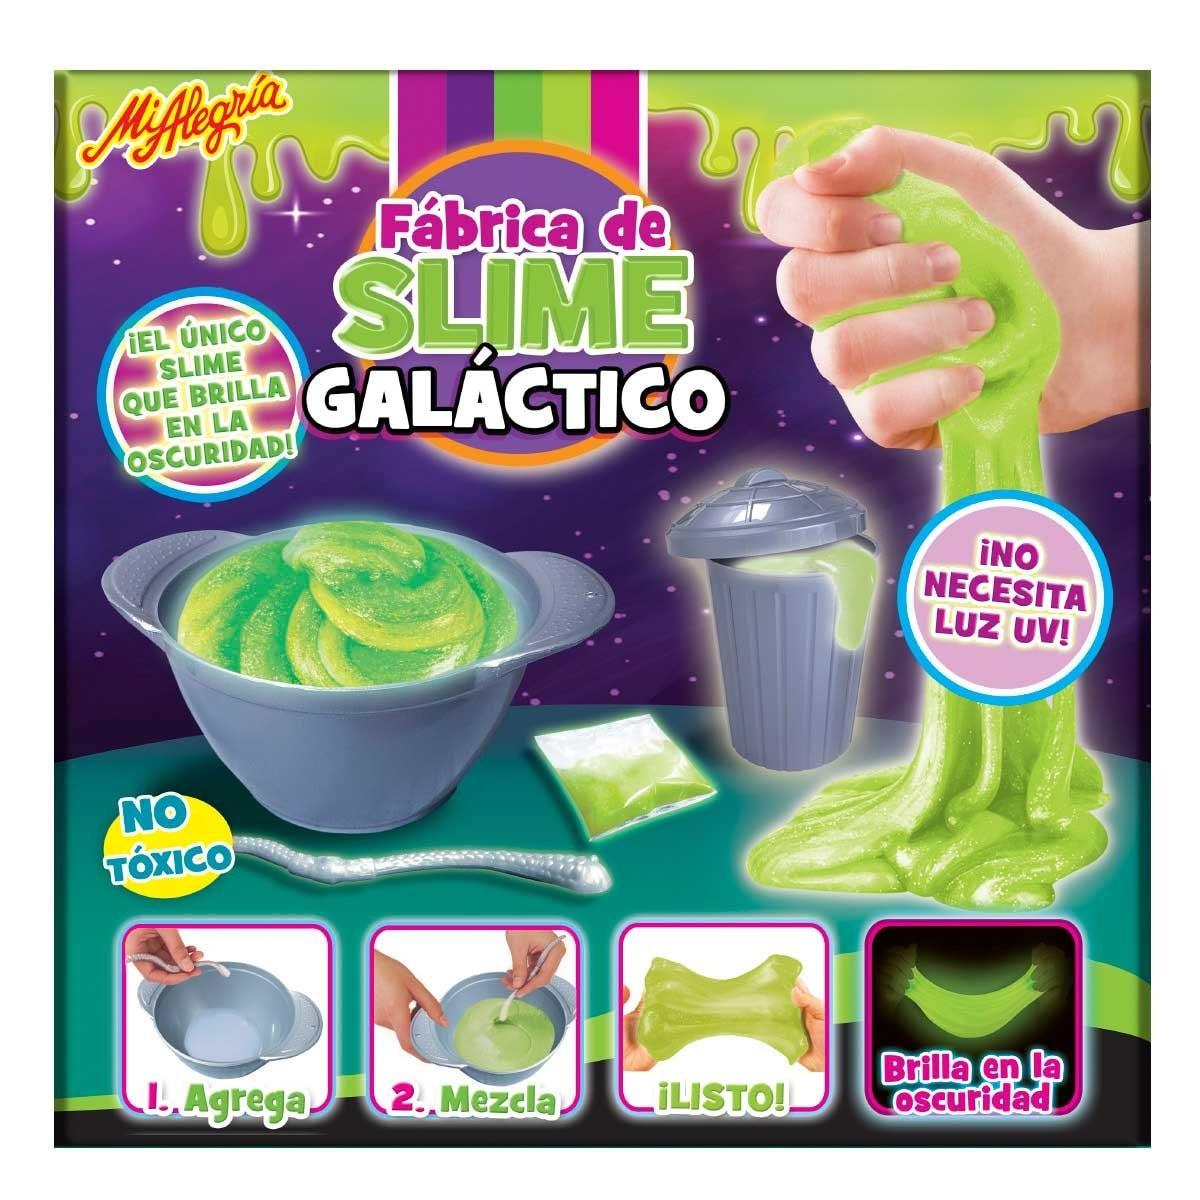 Fabrica de Slime Galactico Mi Alegria